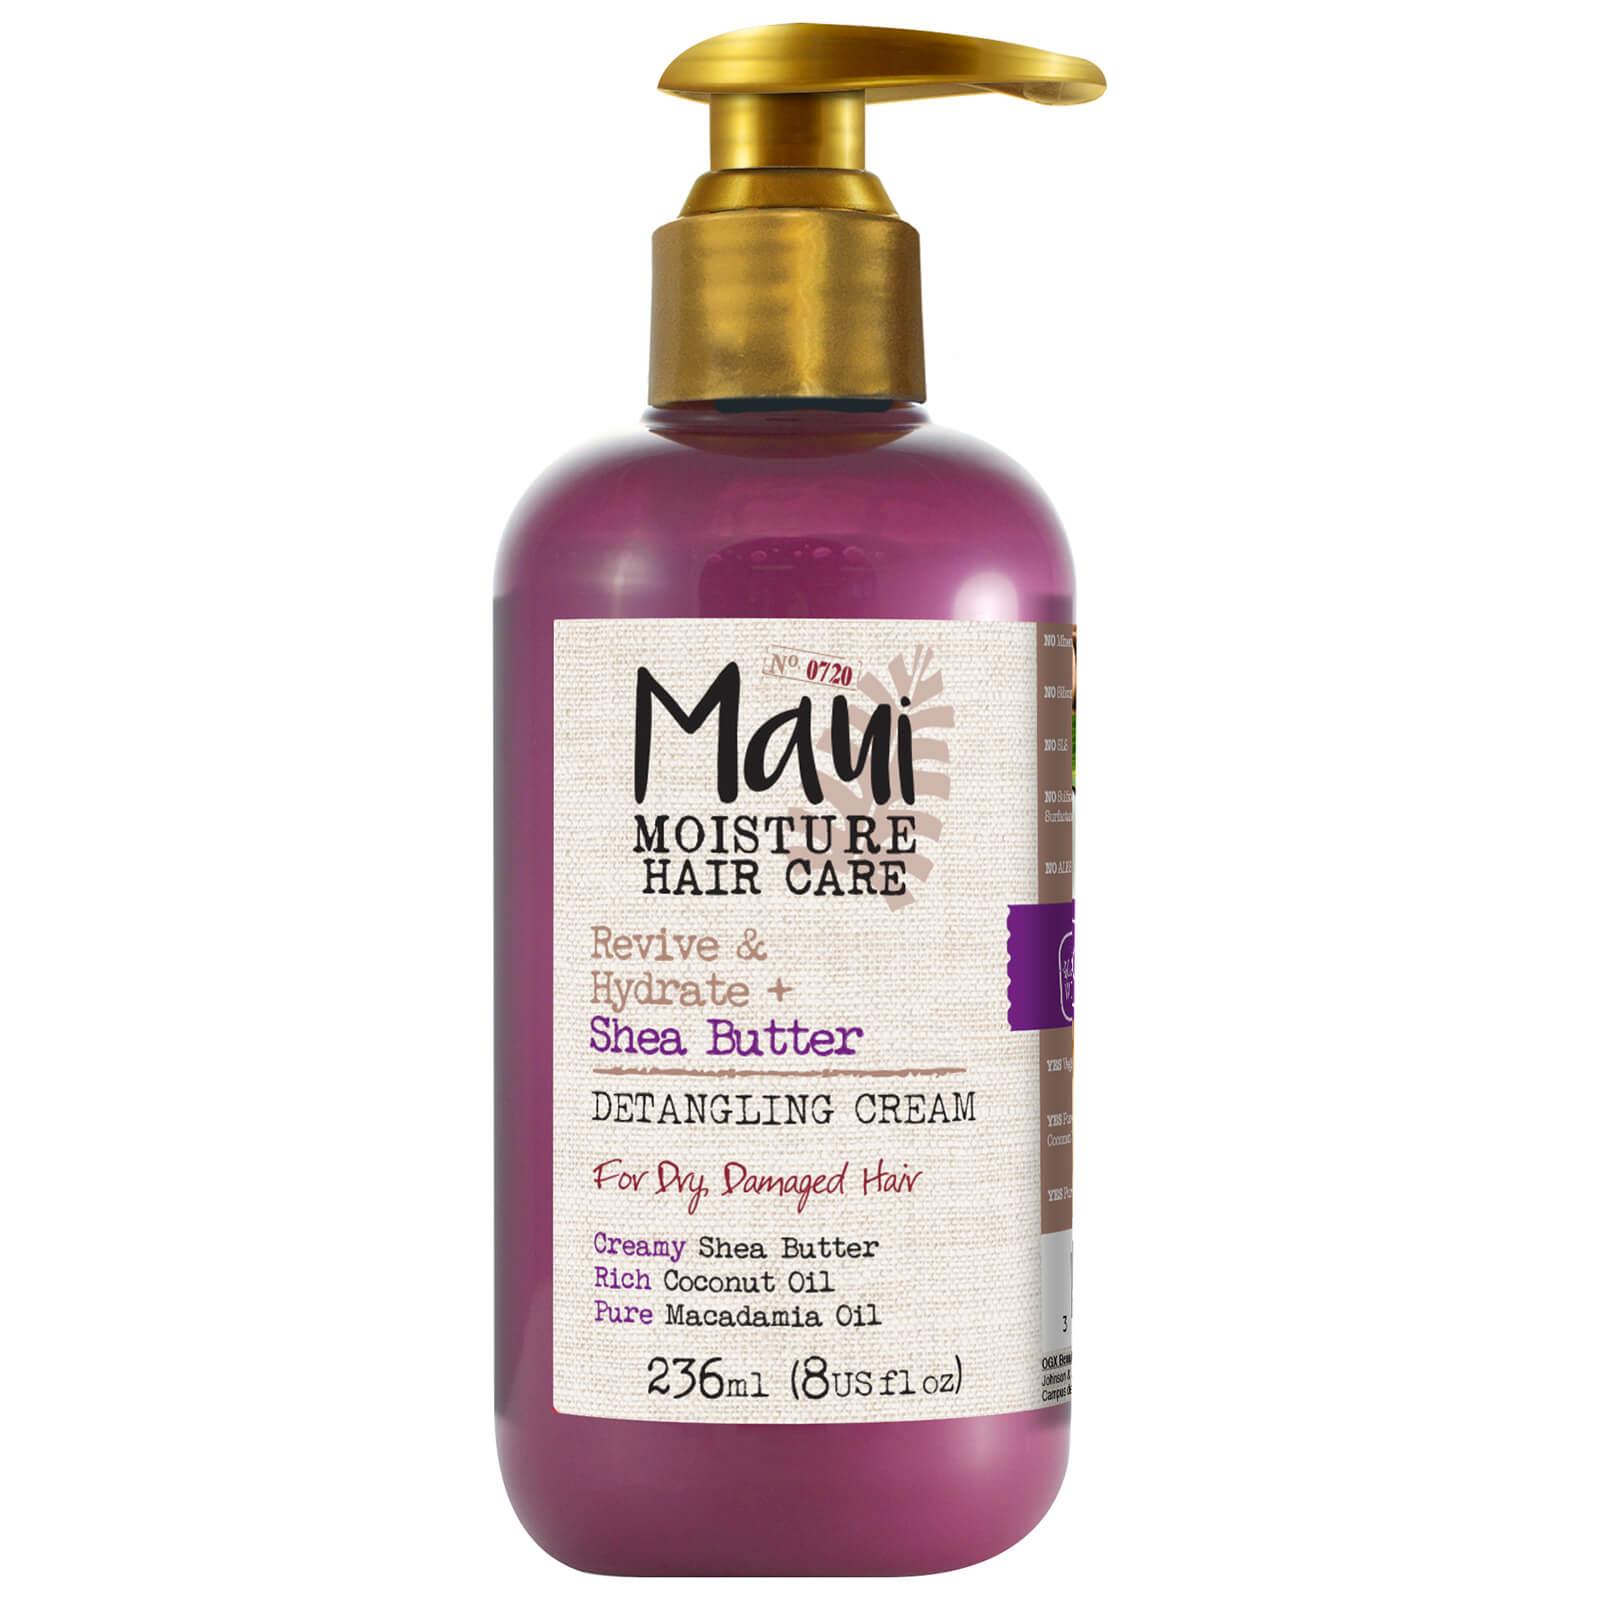 Купить Maui Moisture Revive and Hydrate+ Shea Butter Detangling Cream 236ml